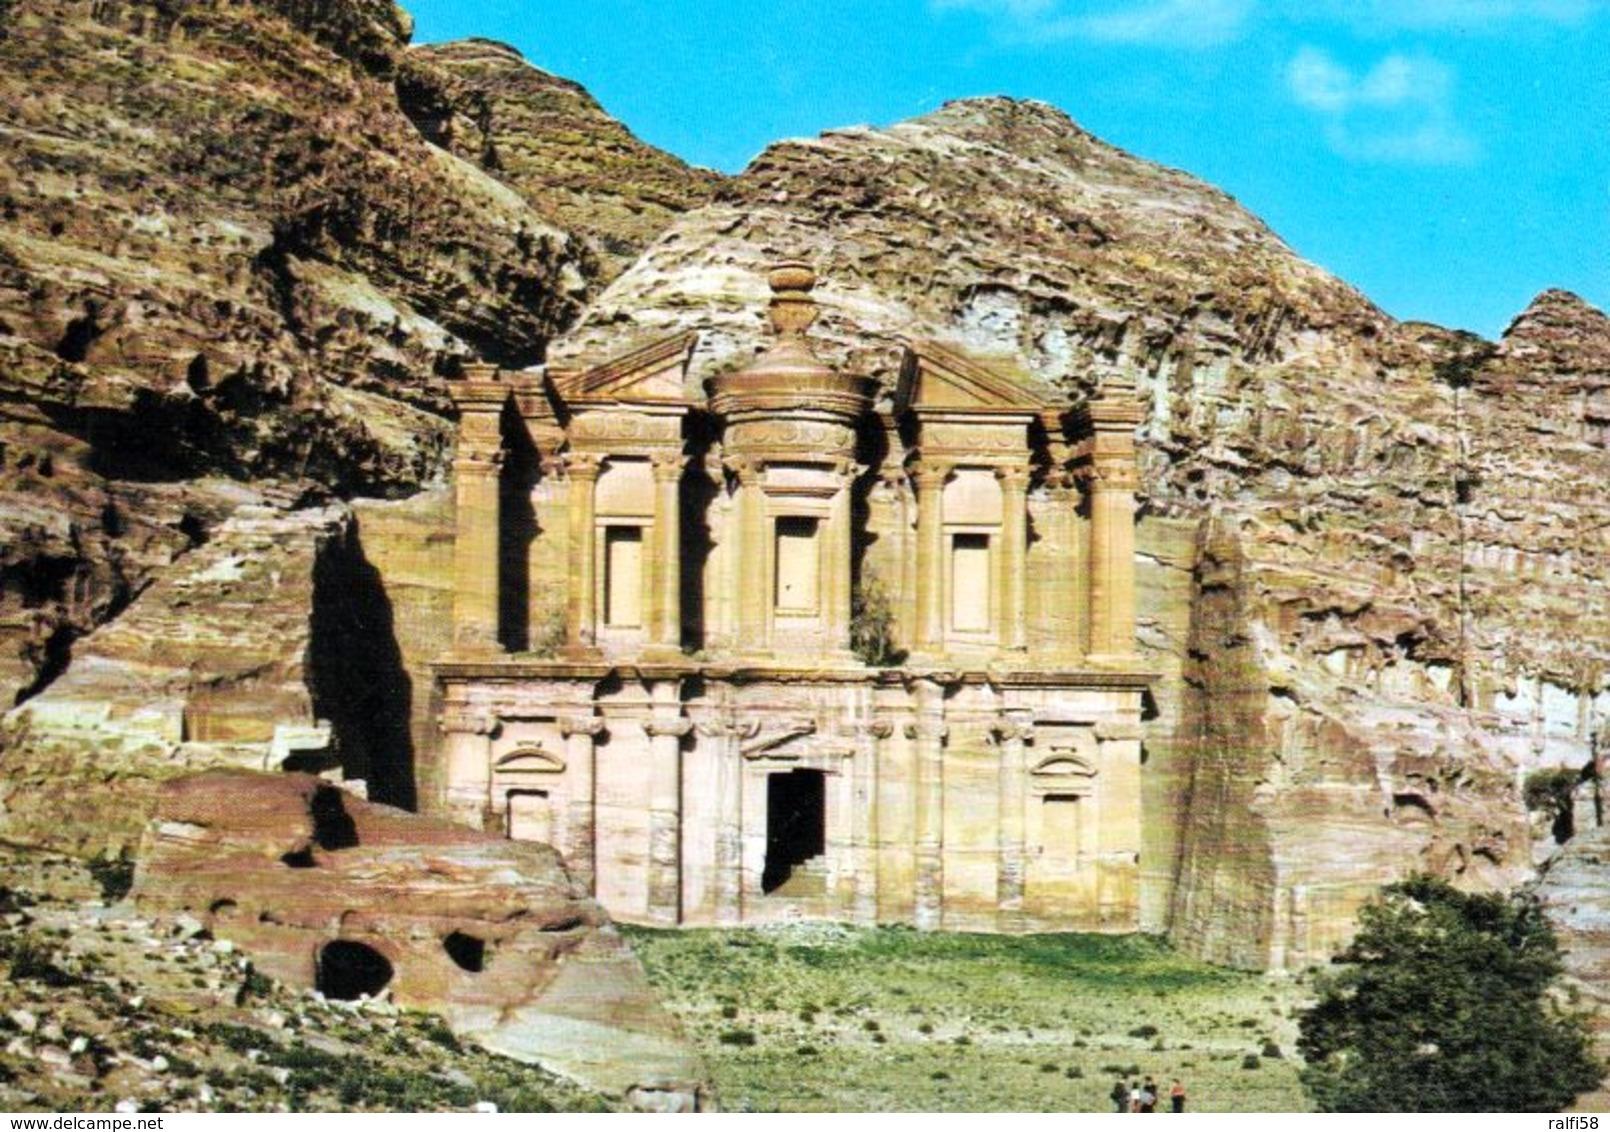 1 AK Jordanien * Tempel Ed-Deir (auch Ad Deir) In Der Antiken Stadt Petra - Erbaut Im 1. Jh. Nach Christus * - Jordanien